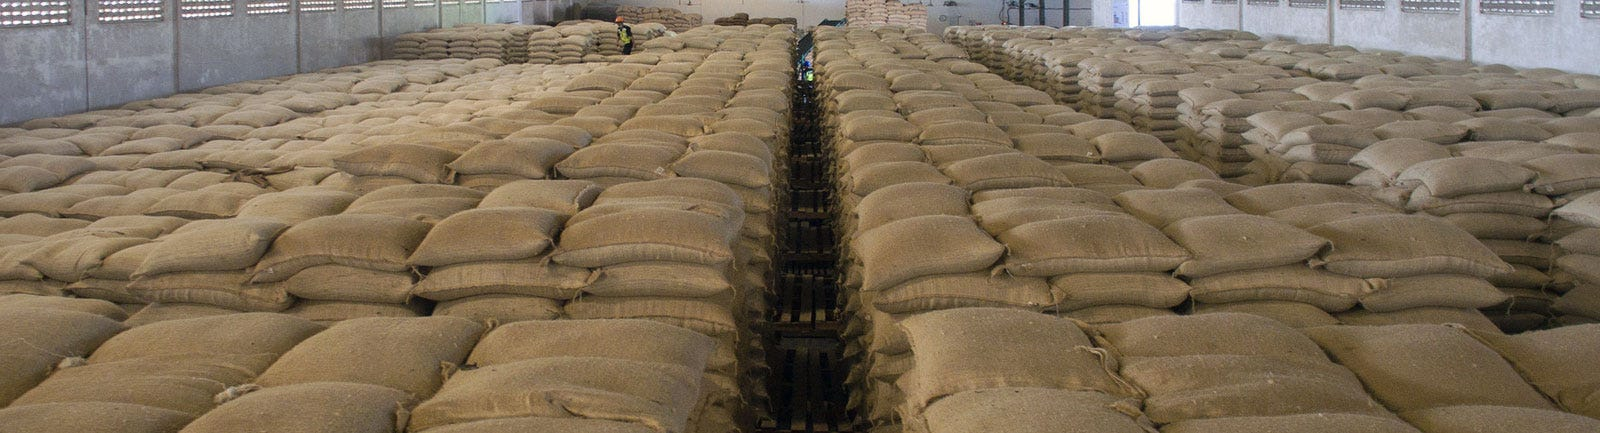 Shipping Coffee